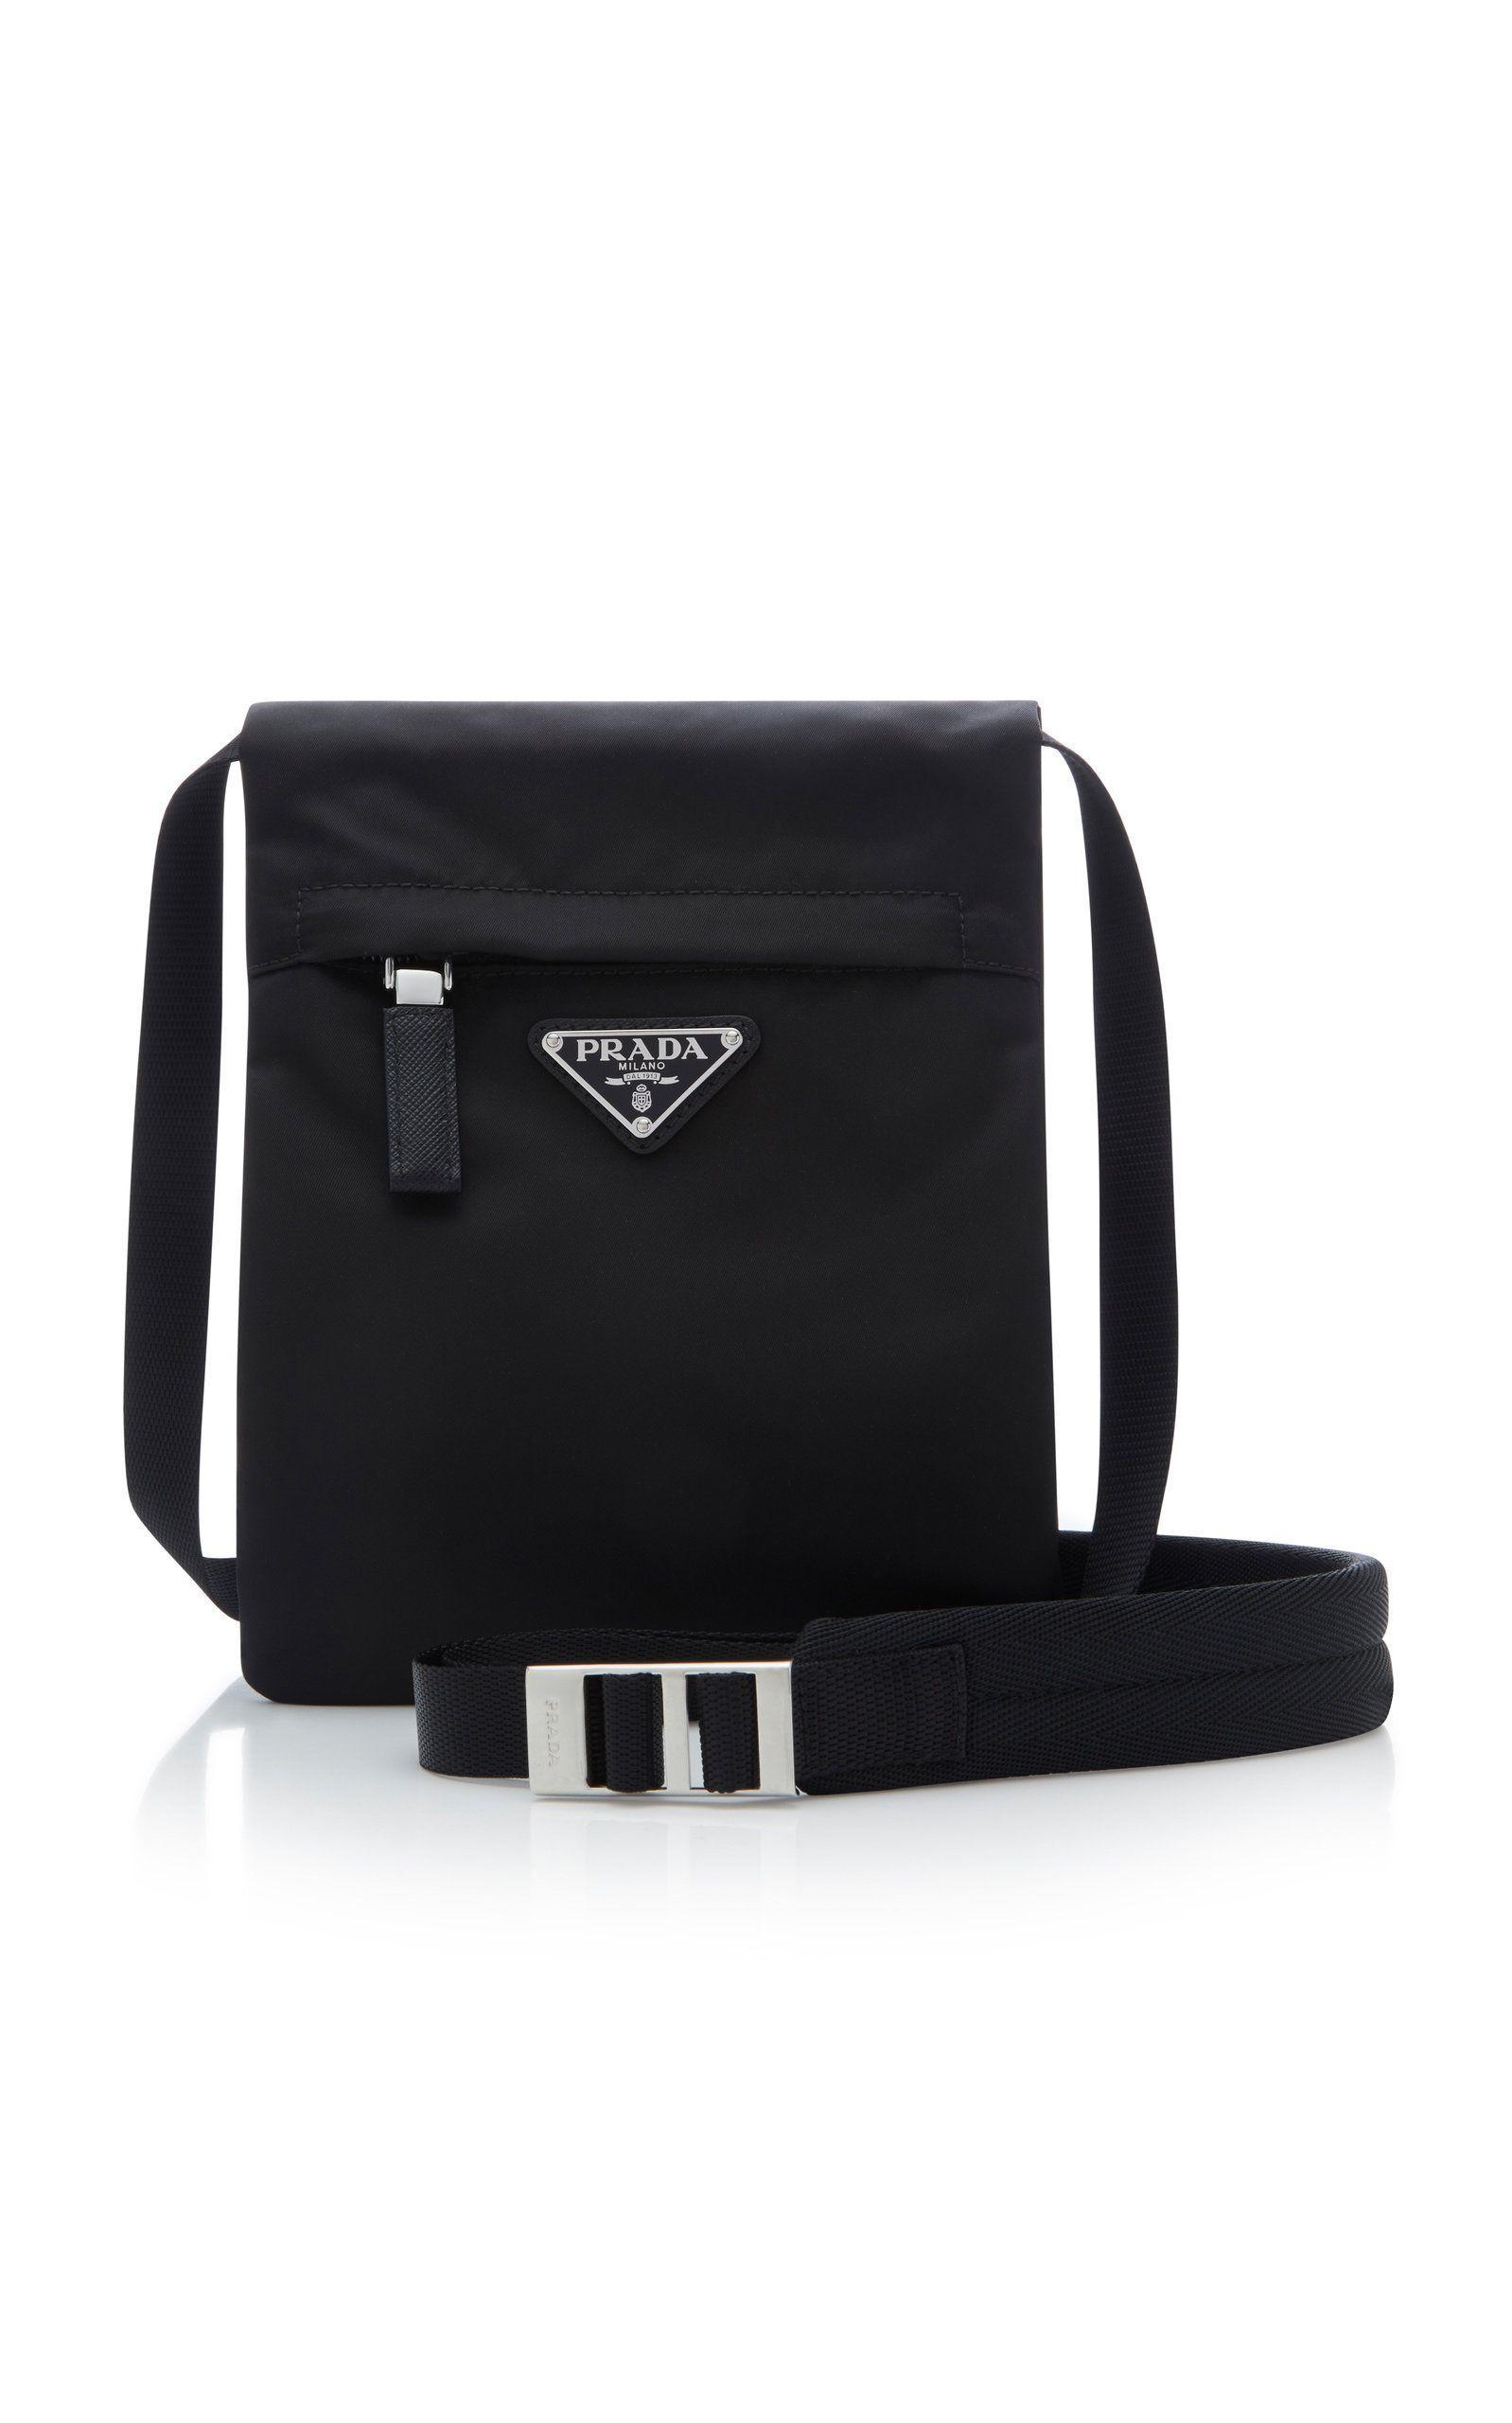 7a0fbc8e79 ... finest selection 2a598 adbcd PRADA SMALL TECHNICAL CROSSBODY BAG. prada bags  shoulder bags crossbody ...